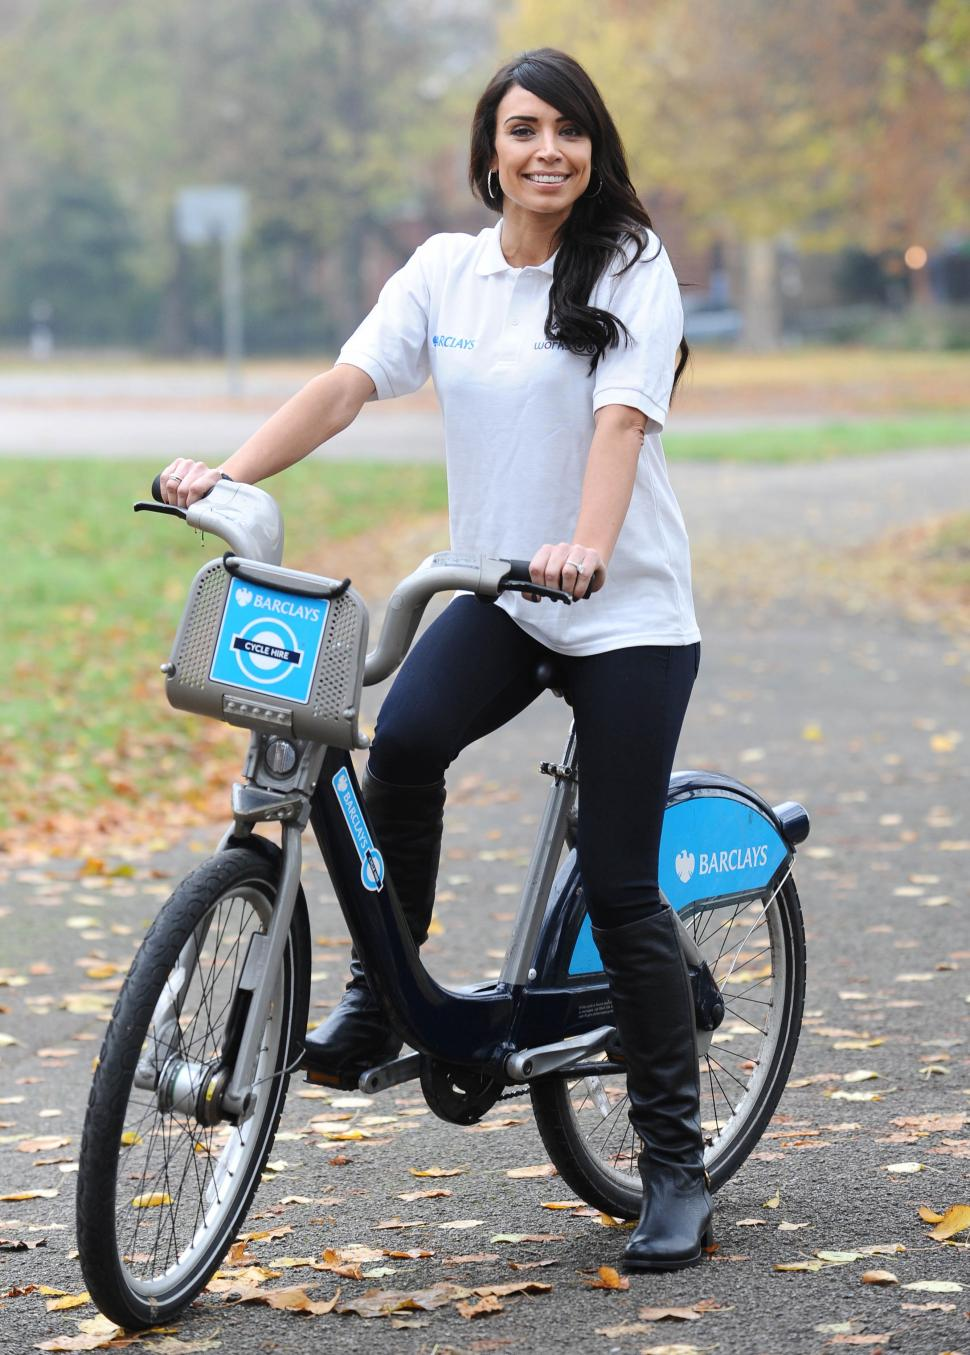 Christine Bleakley on Barclays Cycle Hire bike